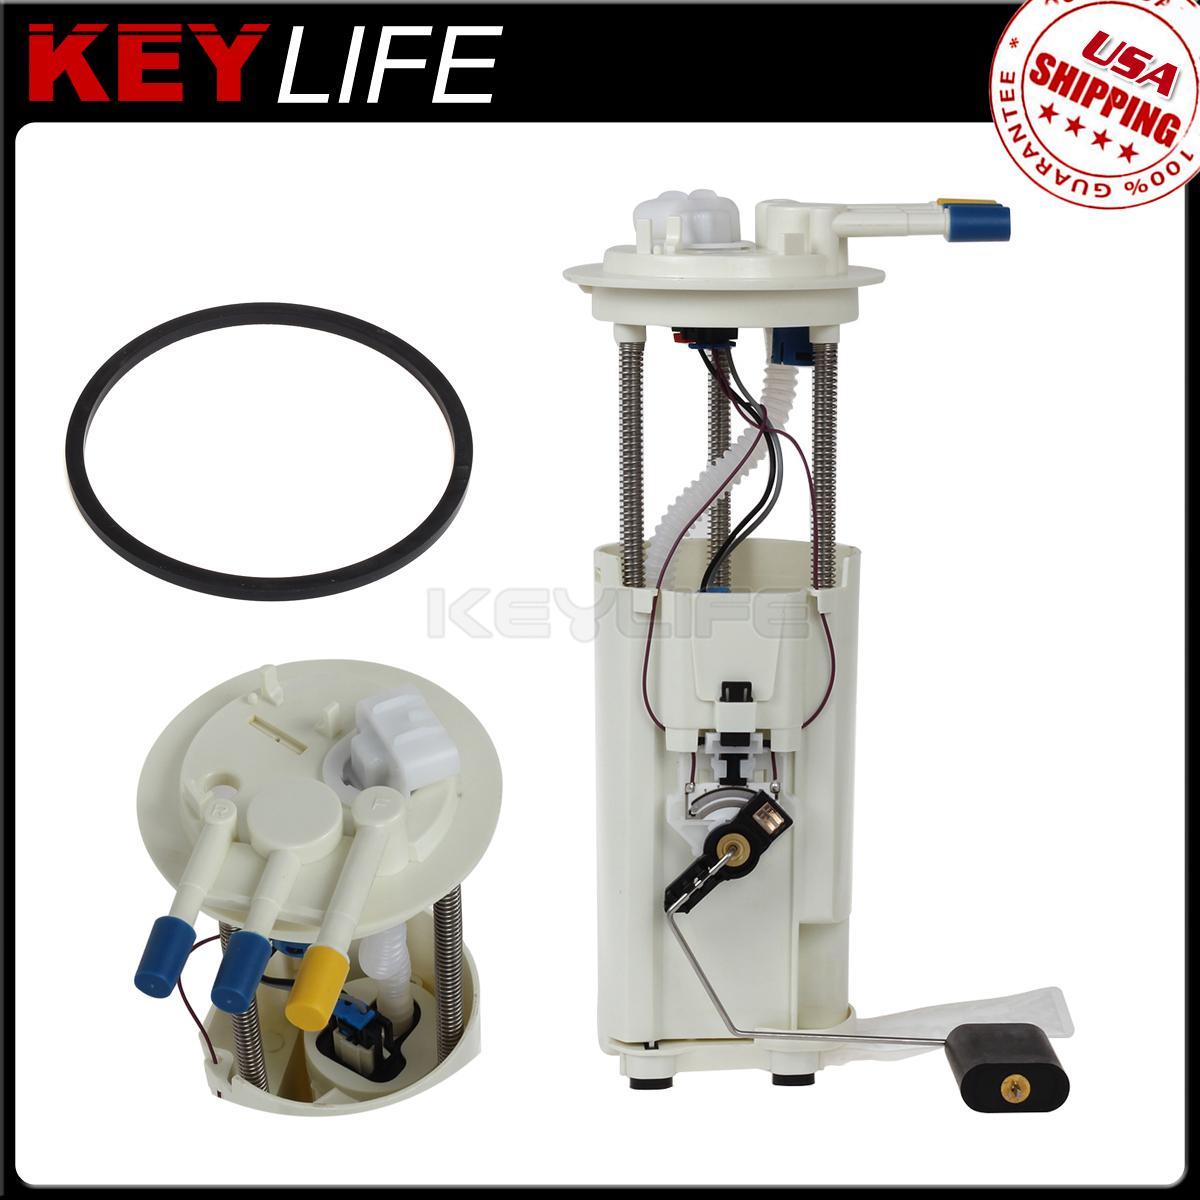 Sp3974m Fuel Pump  U0026 Level Sensor For 98